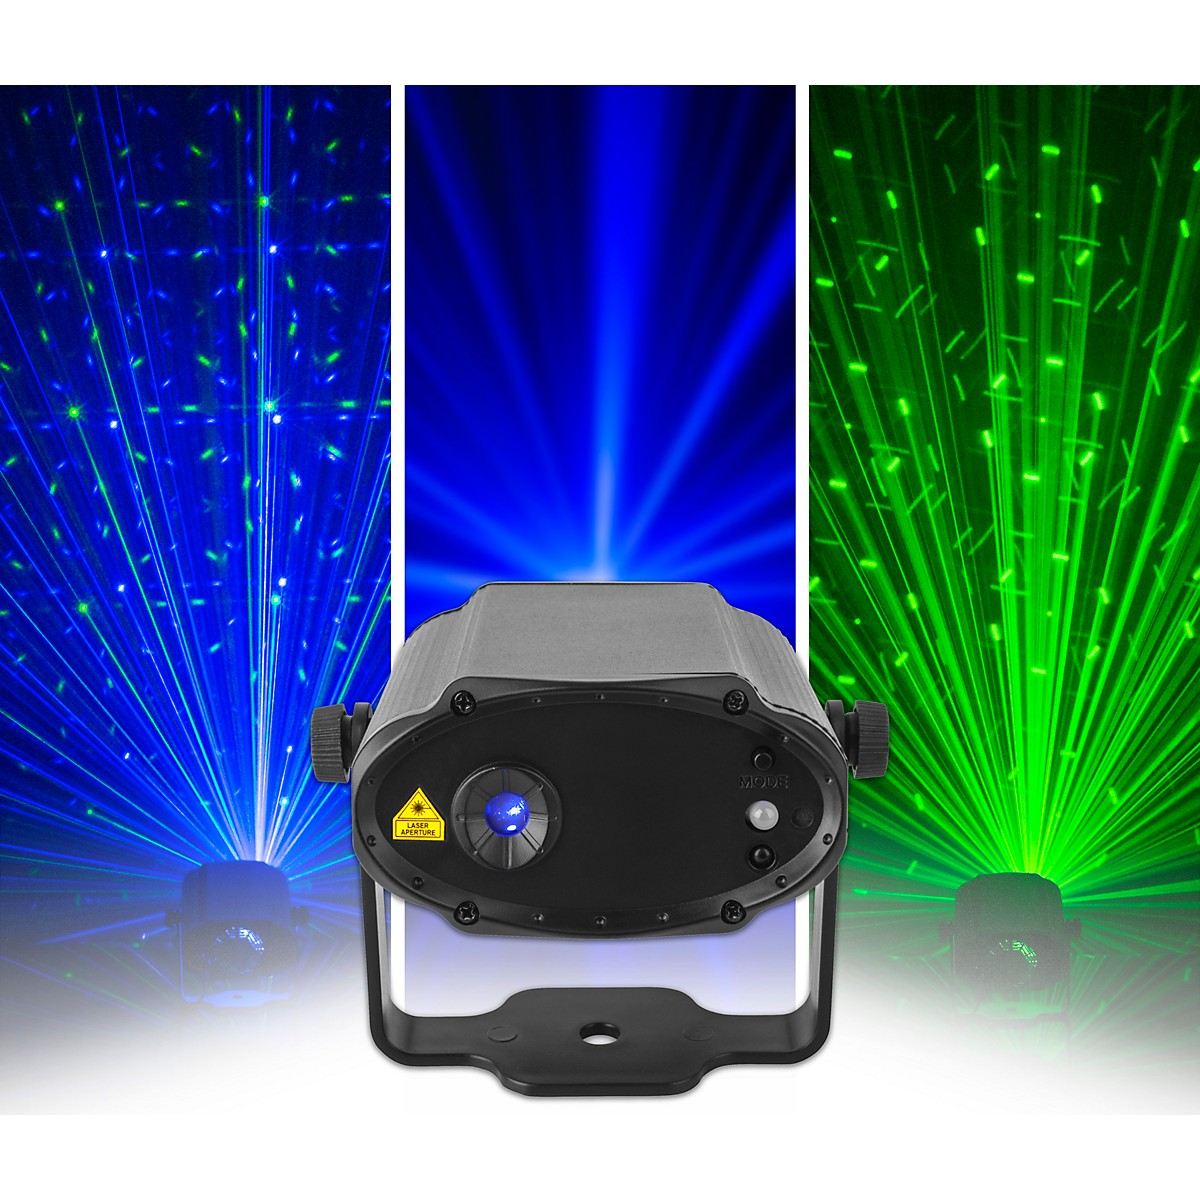 CHAUVET DJ MiN Laser GB Mini Compact Green and Blue Laser